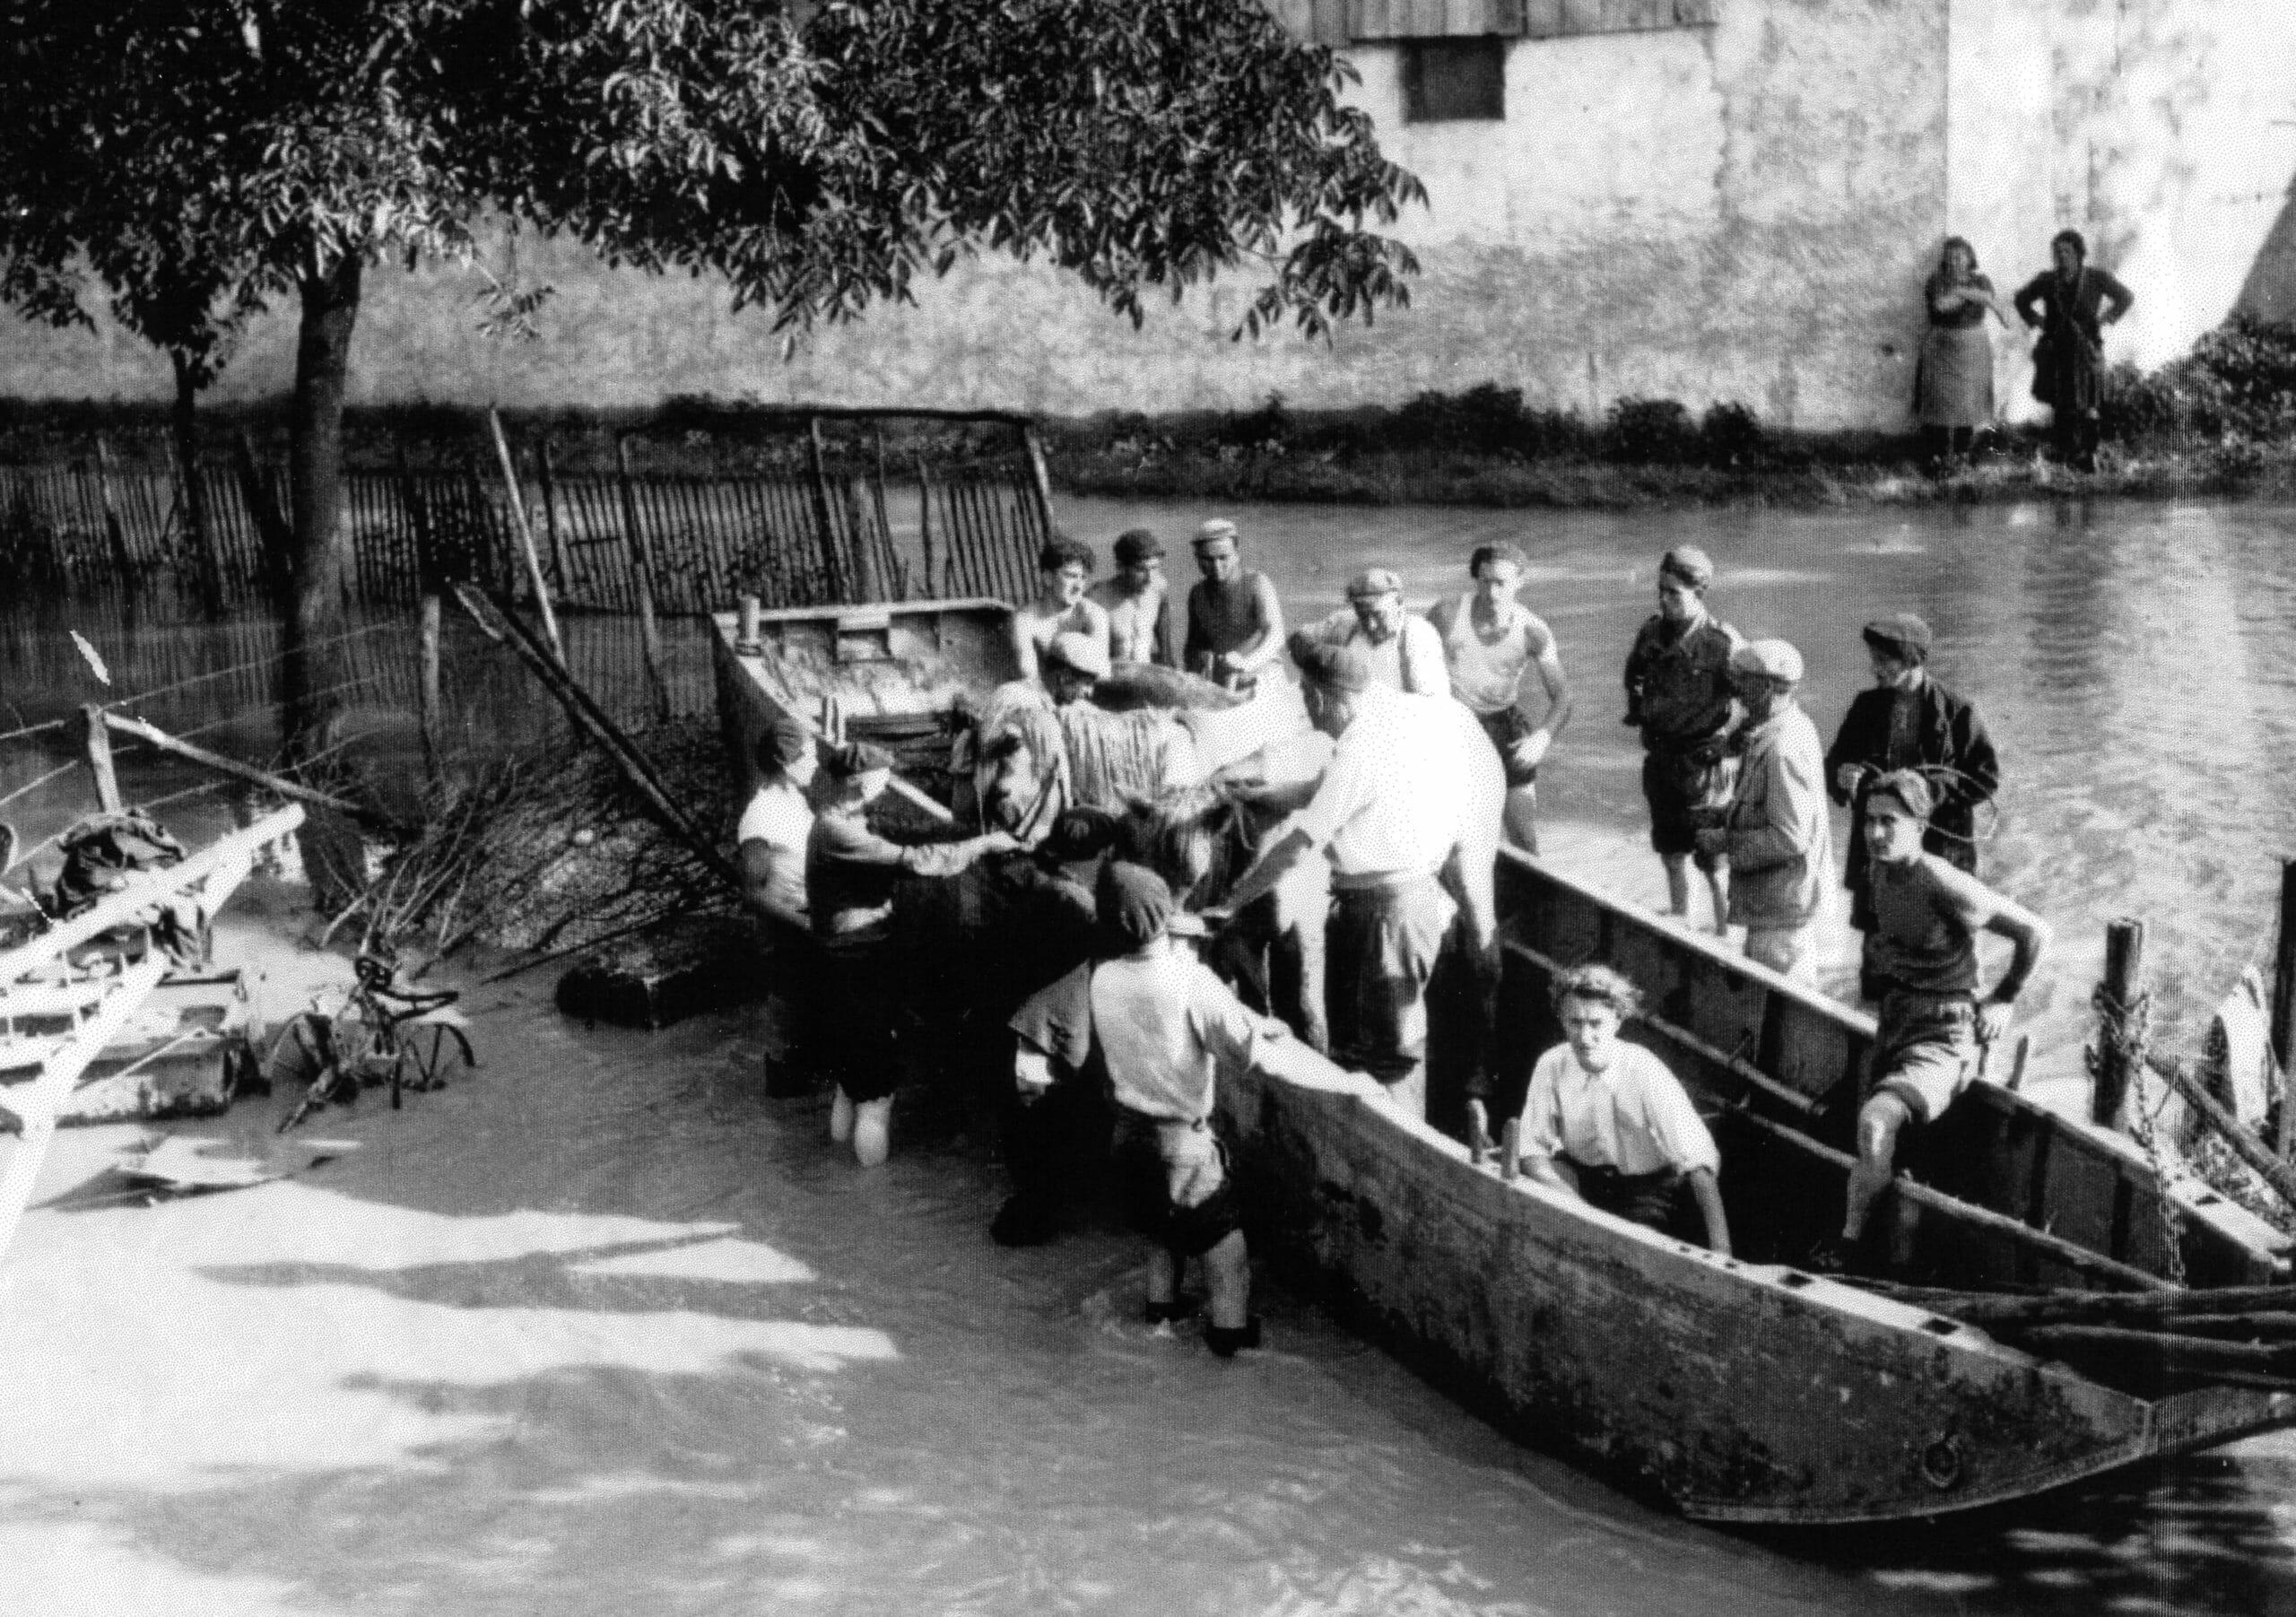 JUIN 1948 IMAGE G.FOURNIER ARCHIVES MOIRANS 1